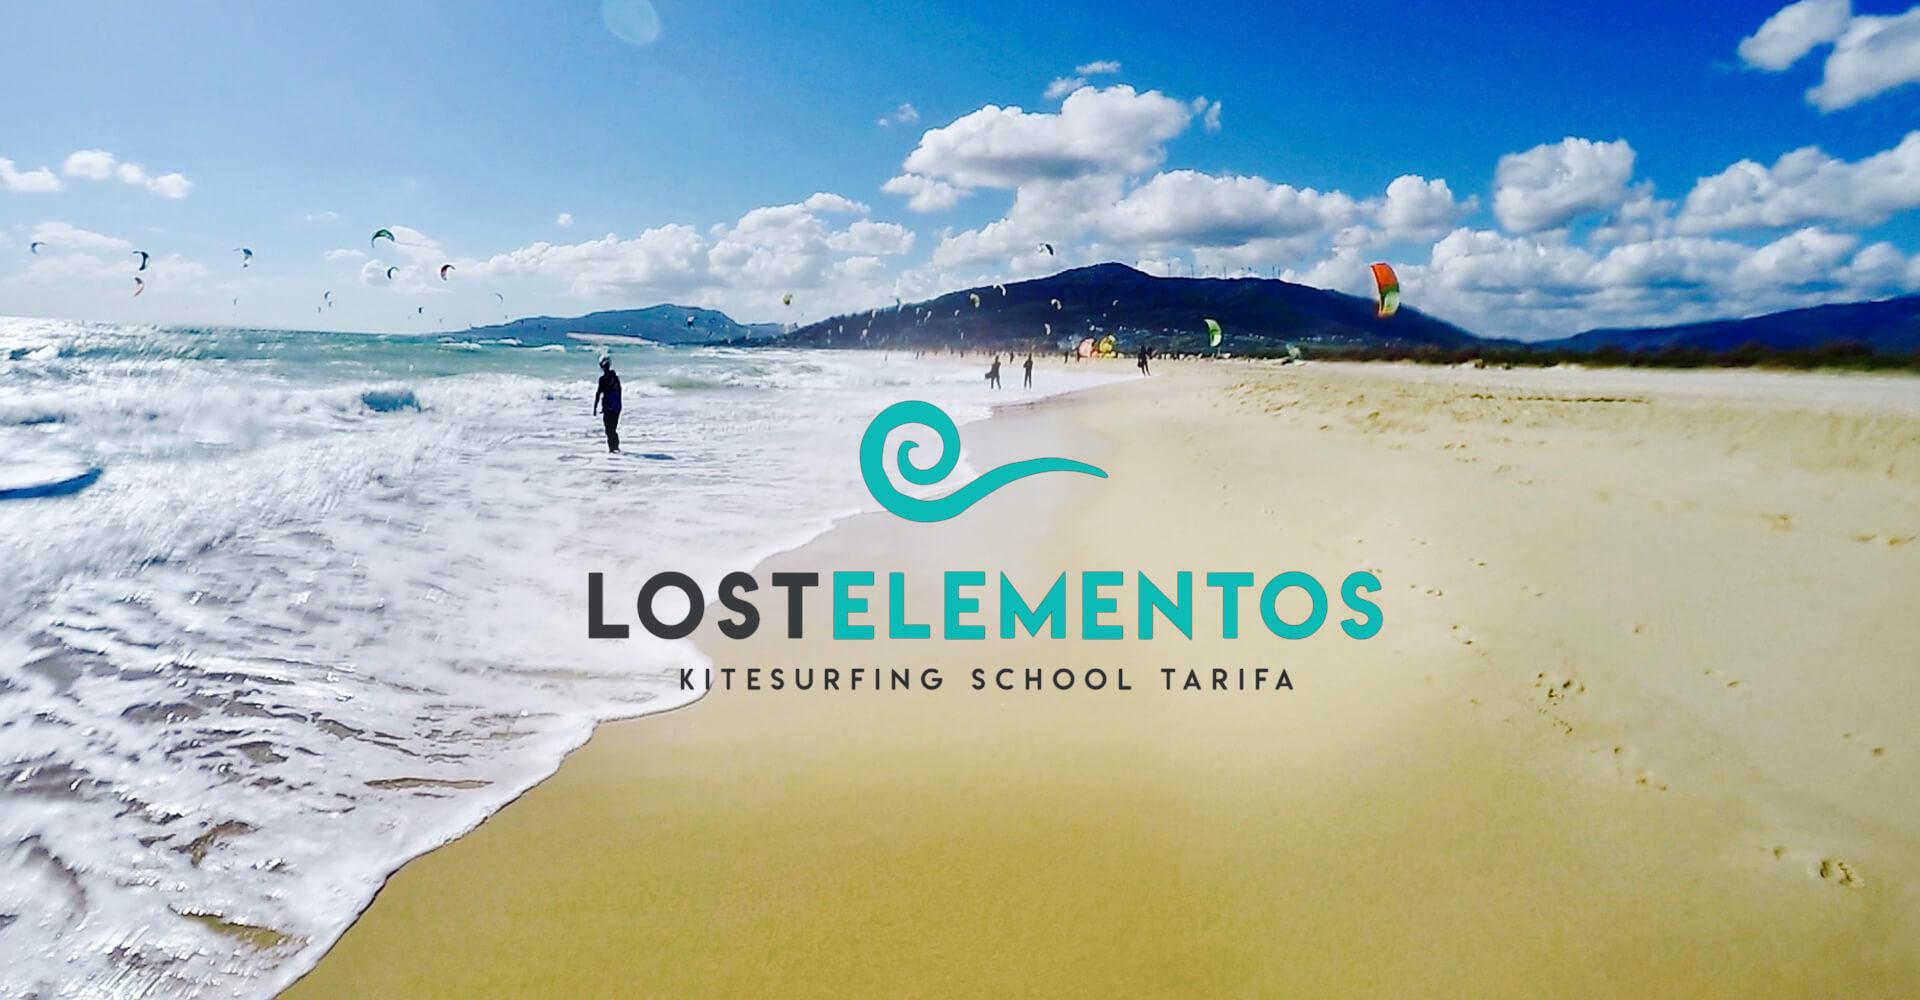 lost_elementos_kitesurfing_tarifa